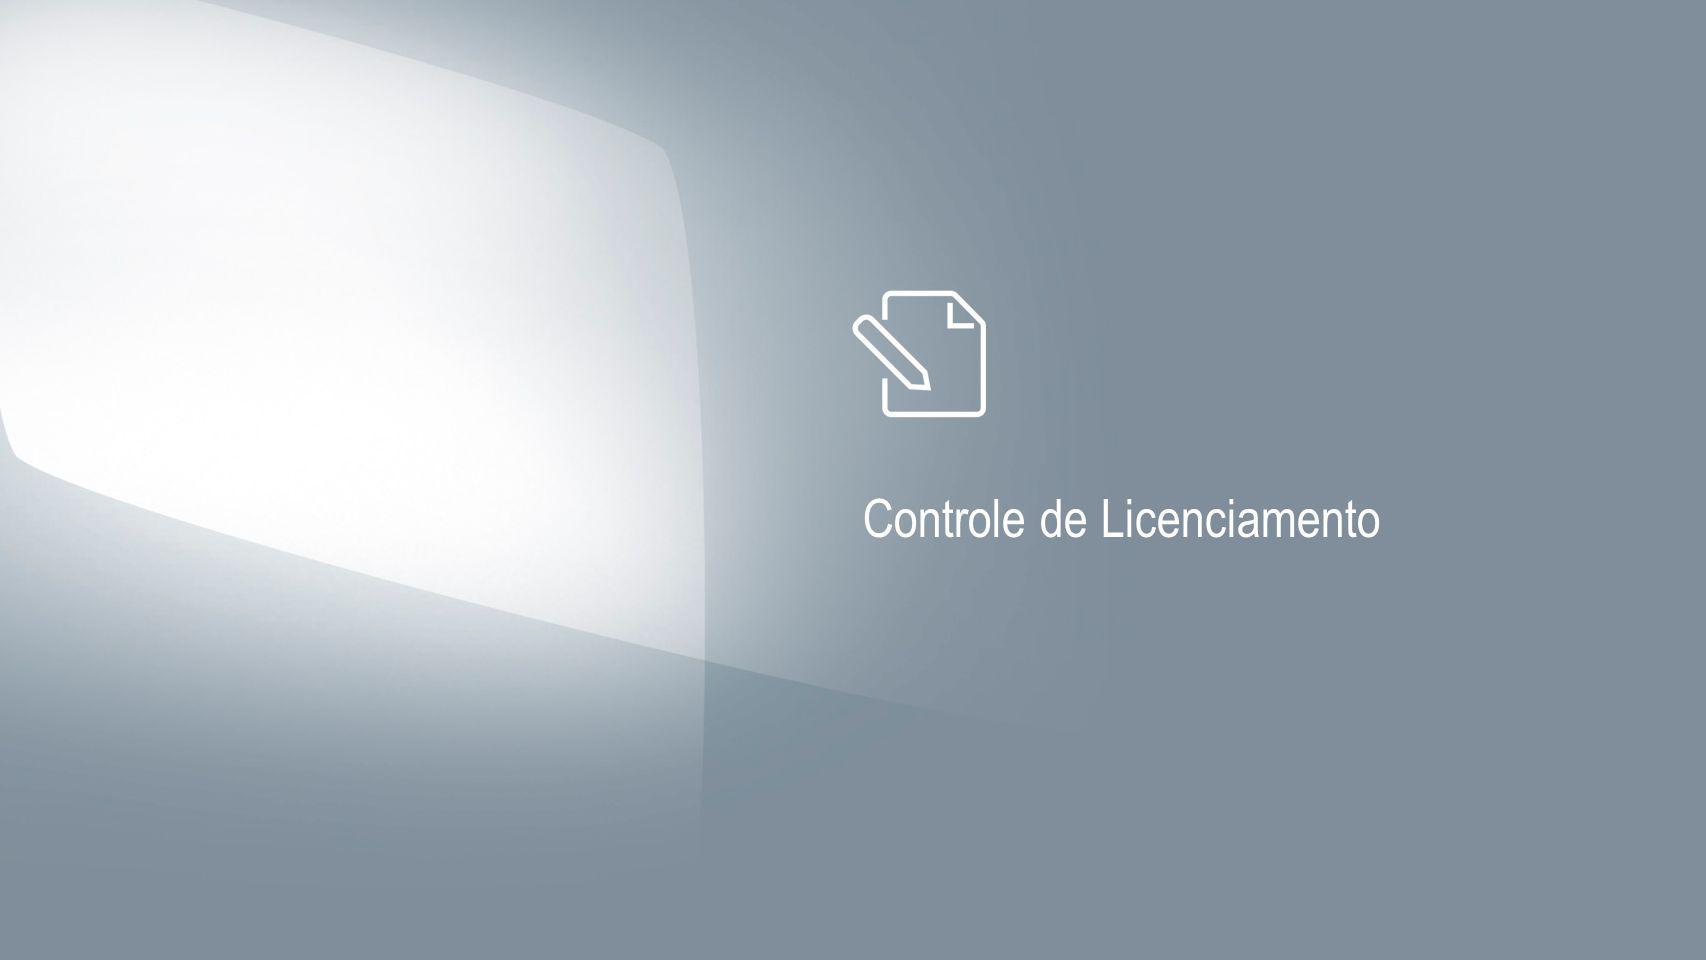 Controle de Licenciamento